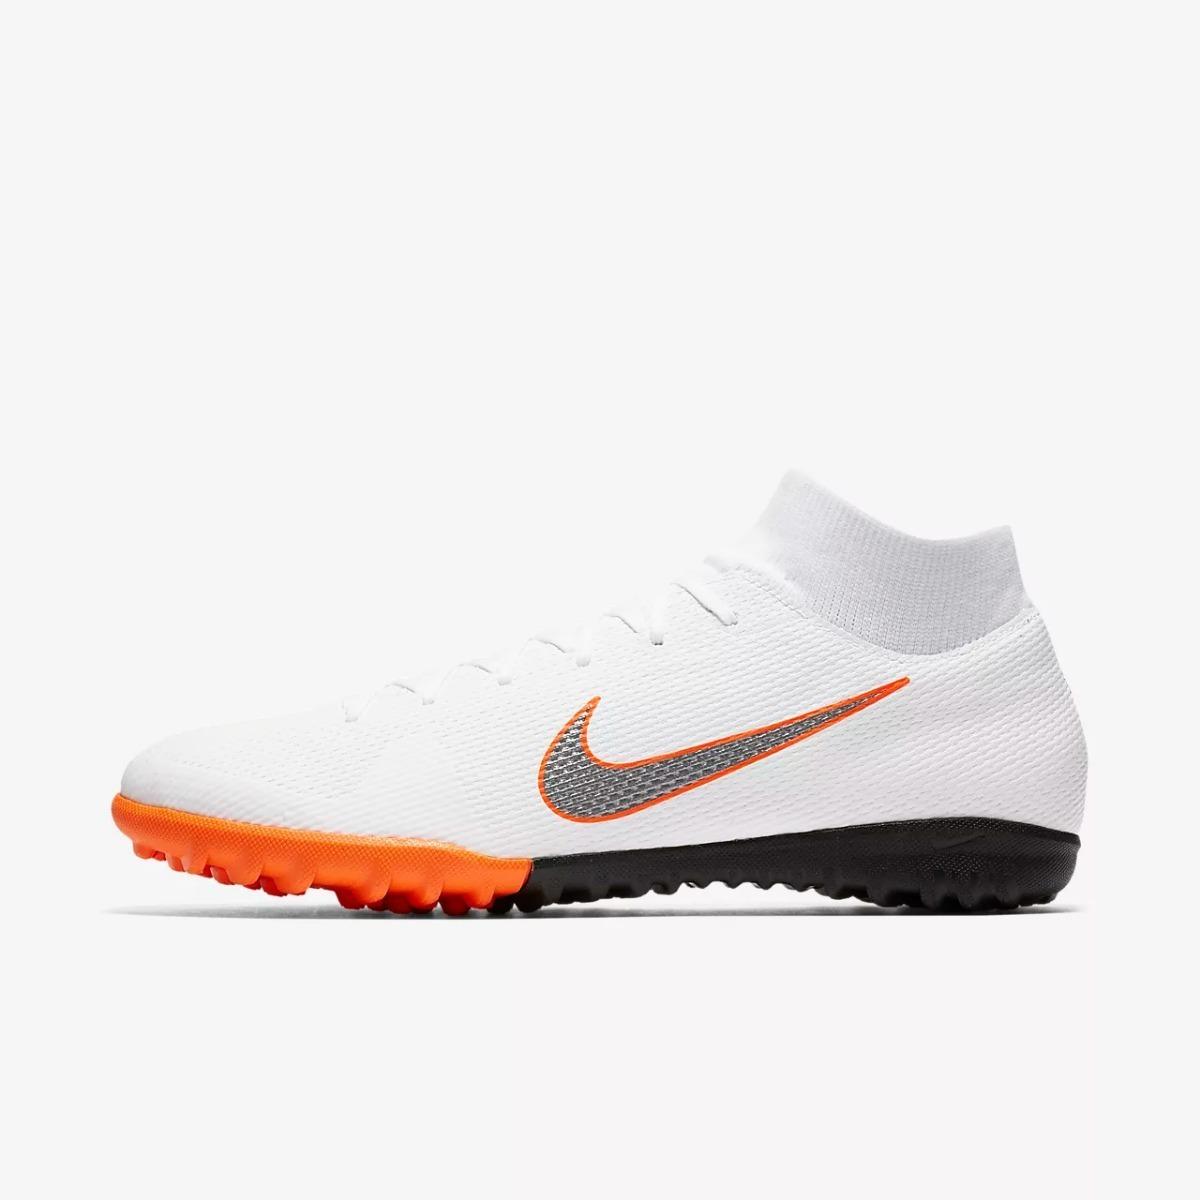 0f26a378 ... best price botas nike mercurial superfly blancos futbol rapido turf. cargando  zoom. 0db6c c8a4e